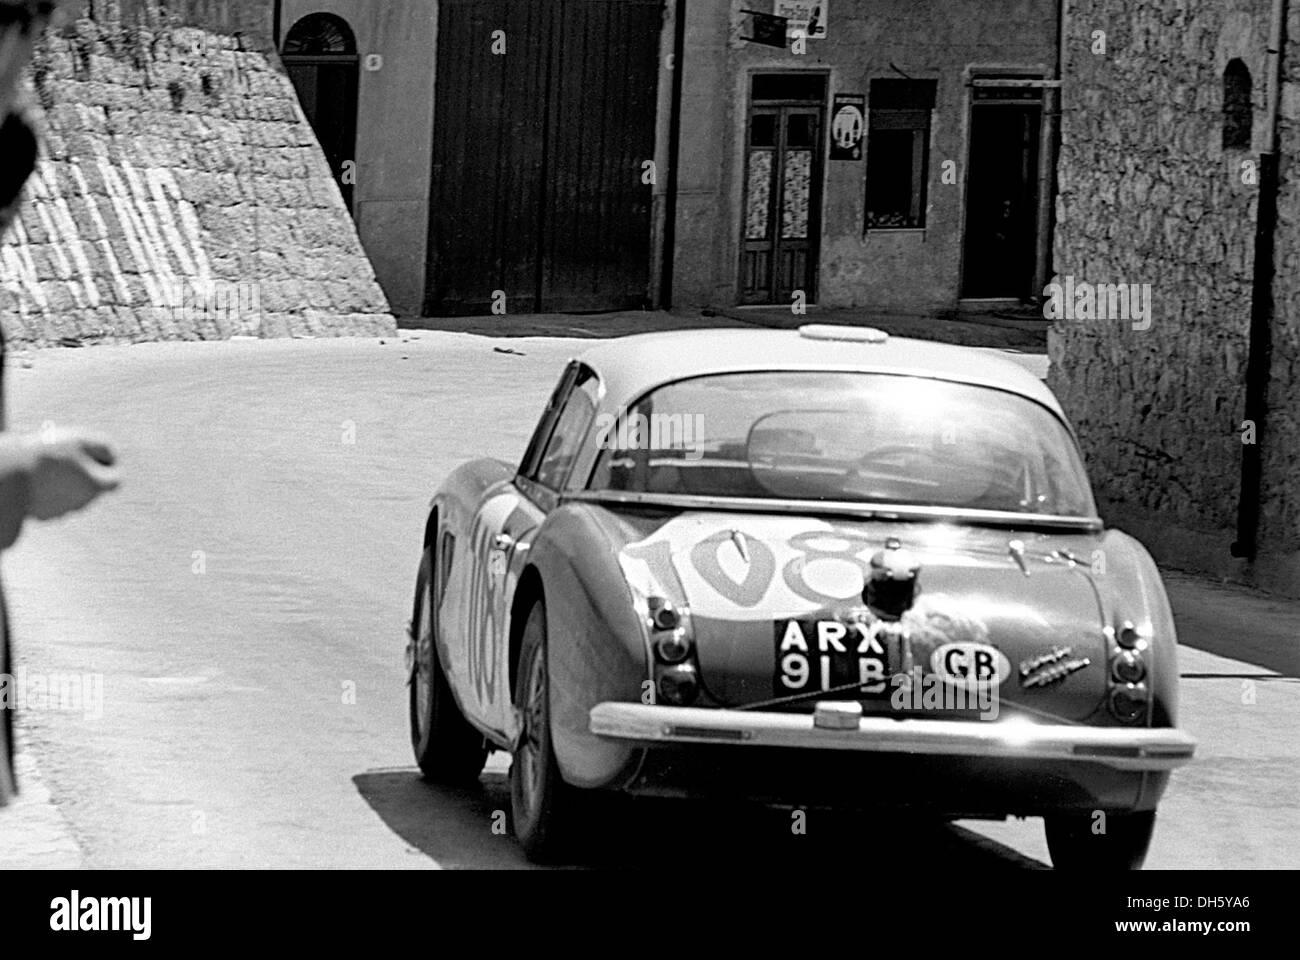 Timo Makinen-Paul Hawkins' Austin Healey 3000 Rennen durch Collesano in der Targa Florio, Sizilien 1965. Stockbild